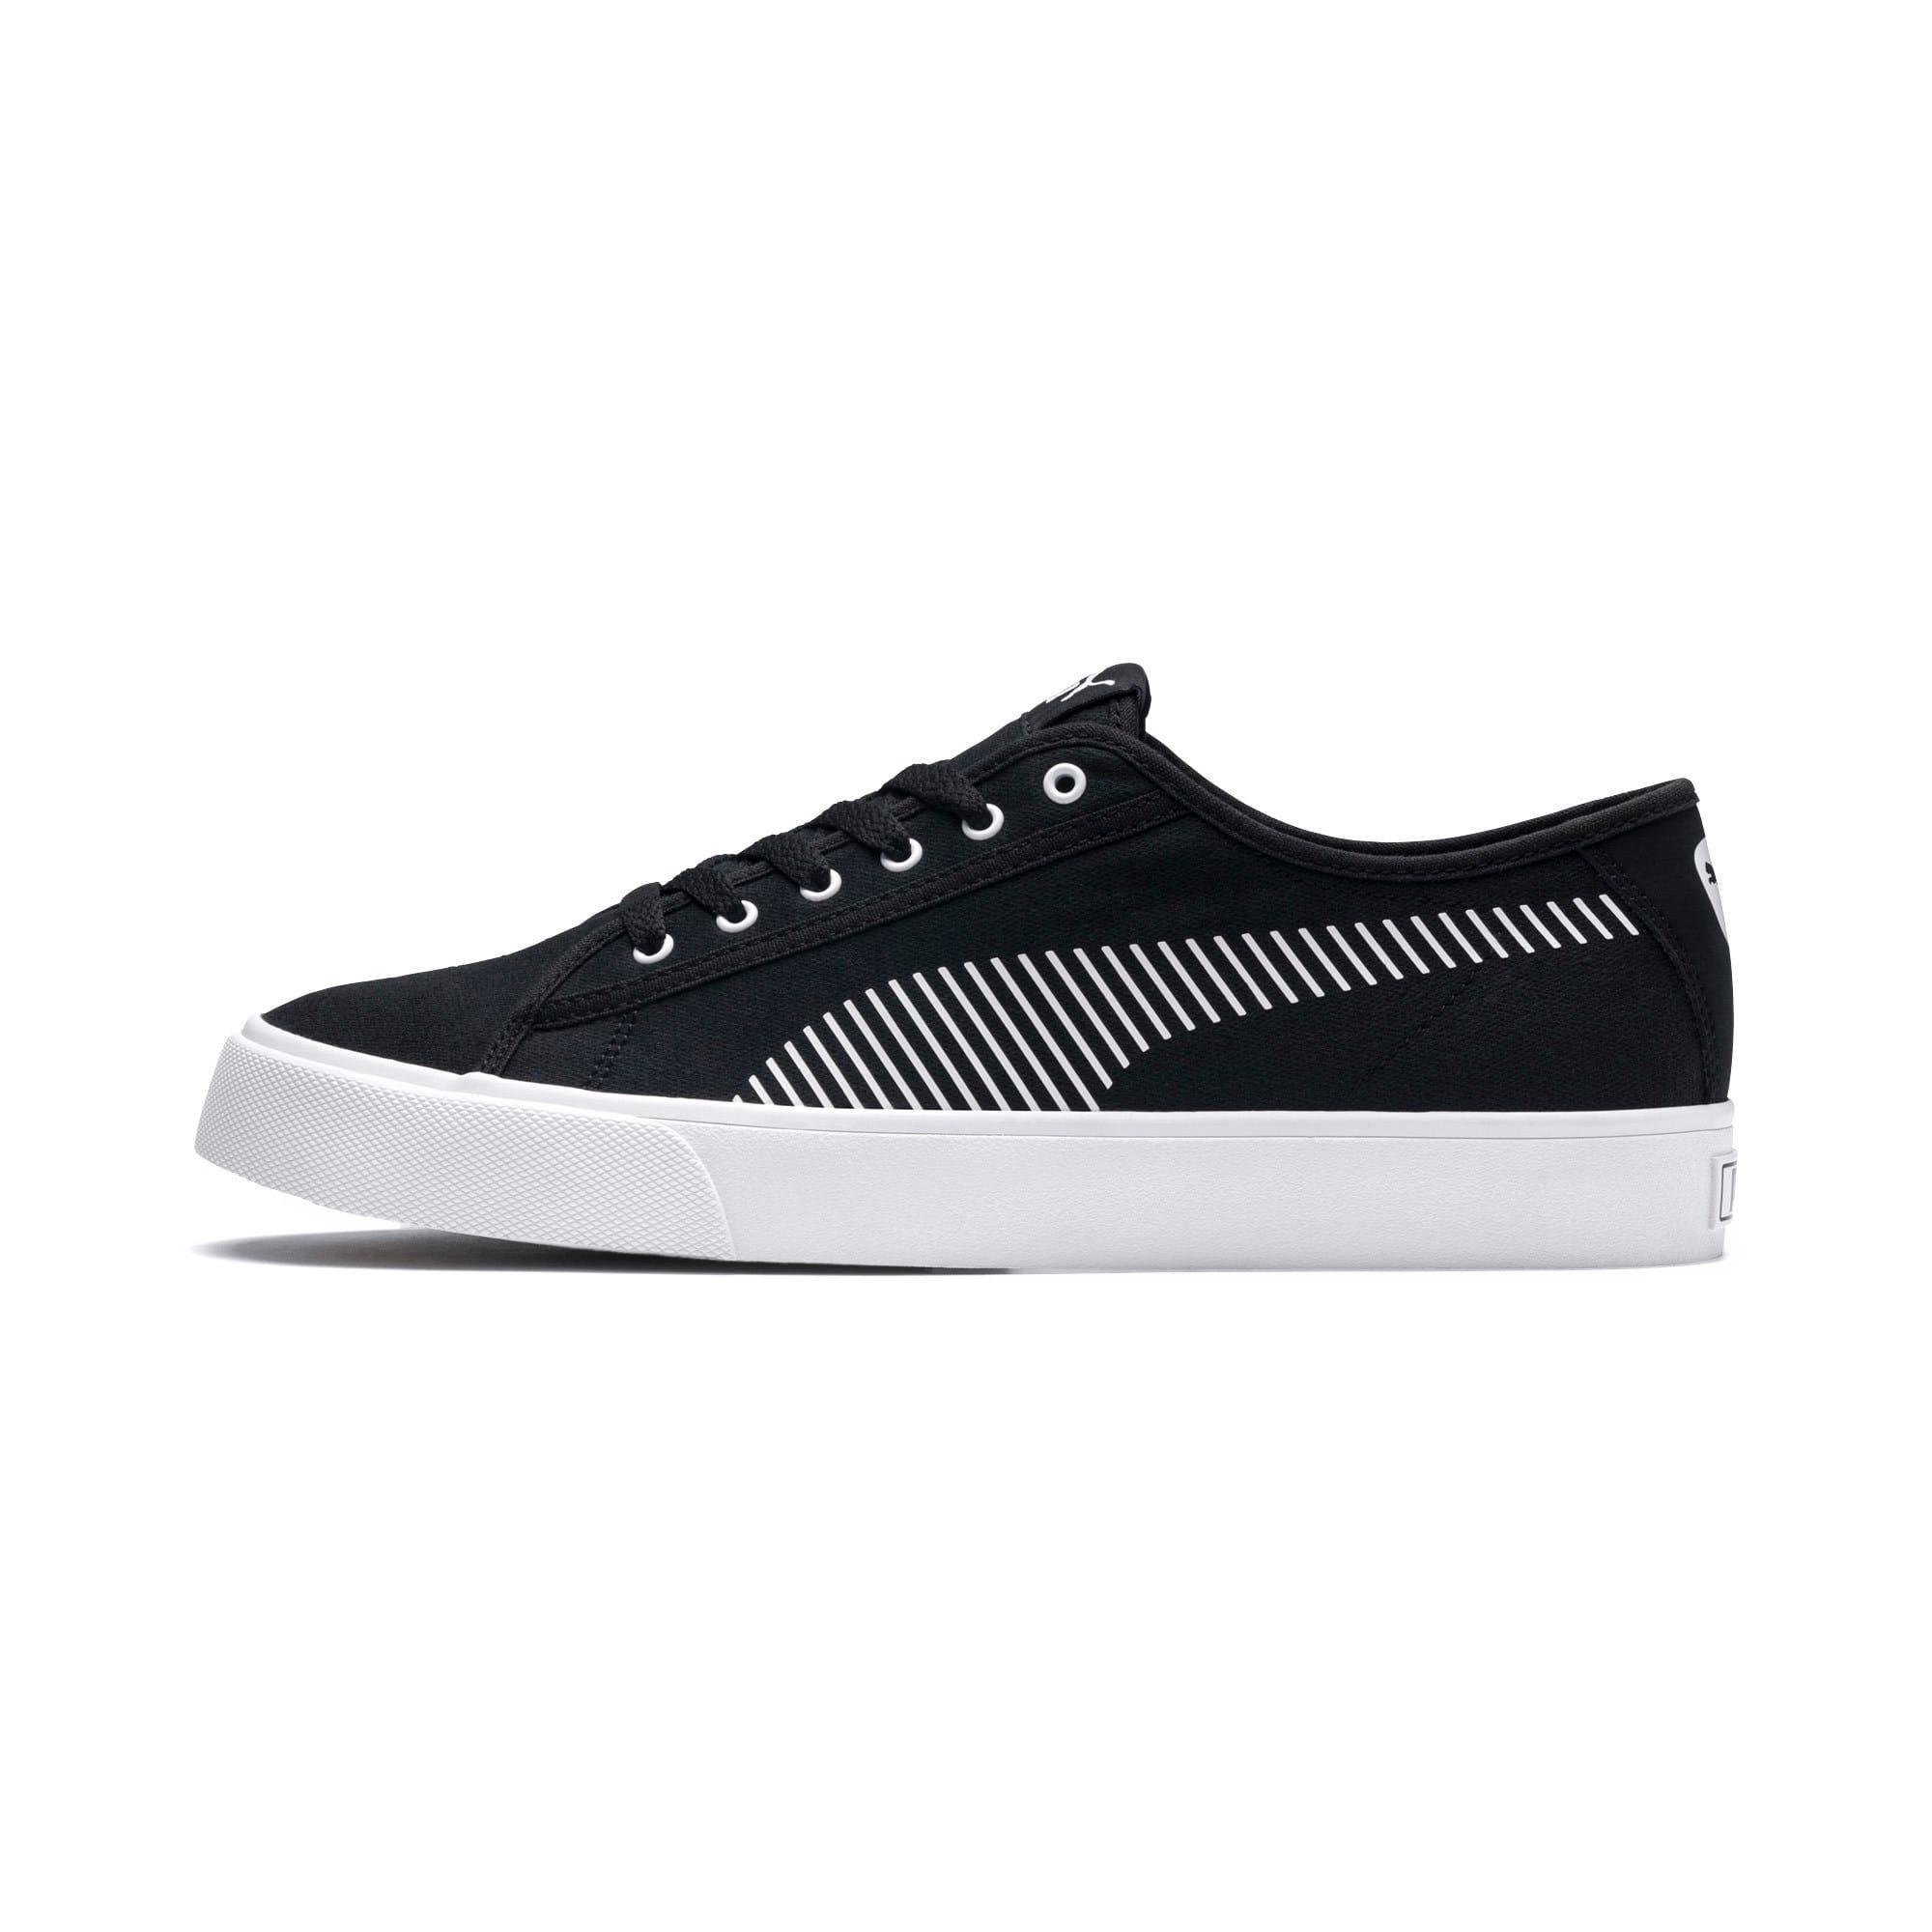 Thumbnail 1 of Bari Sneakers, Puma Black-Puma White, medium